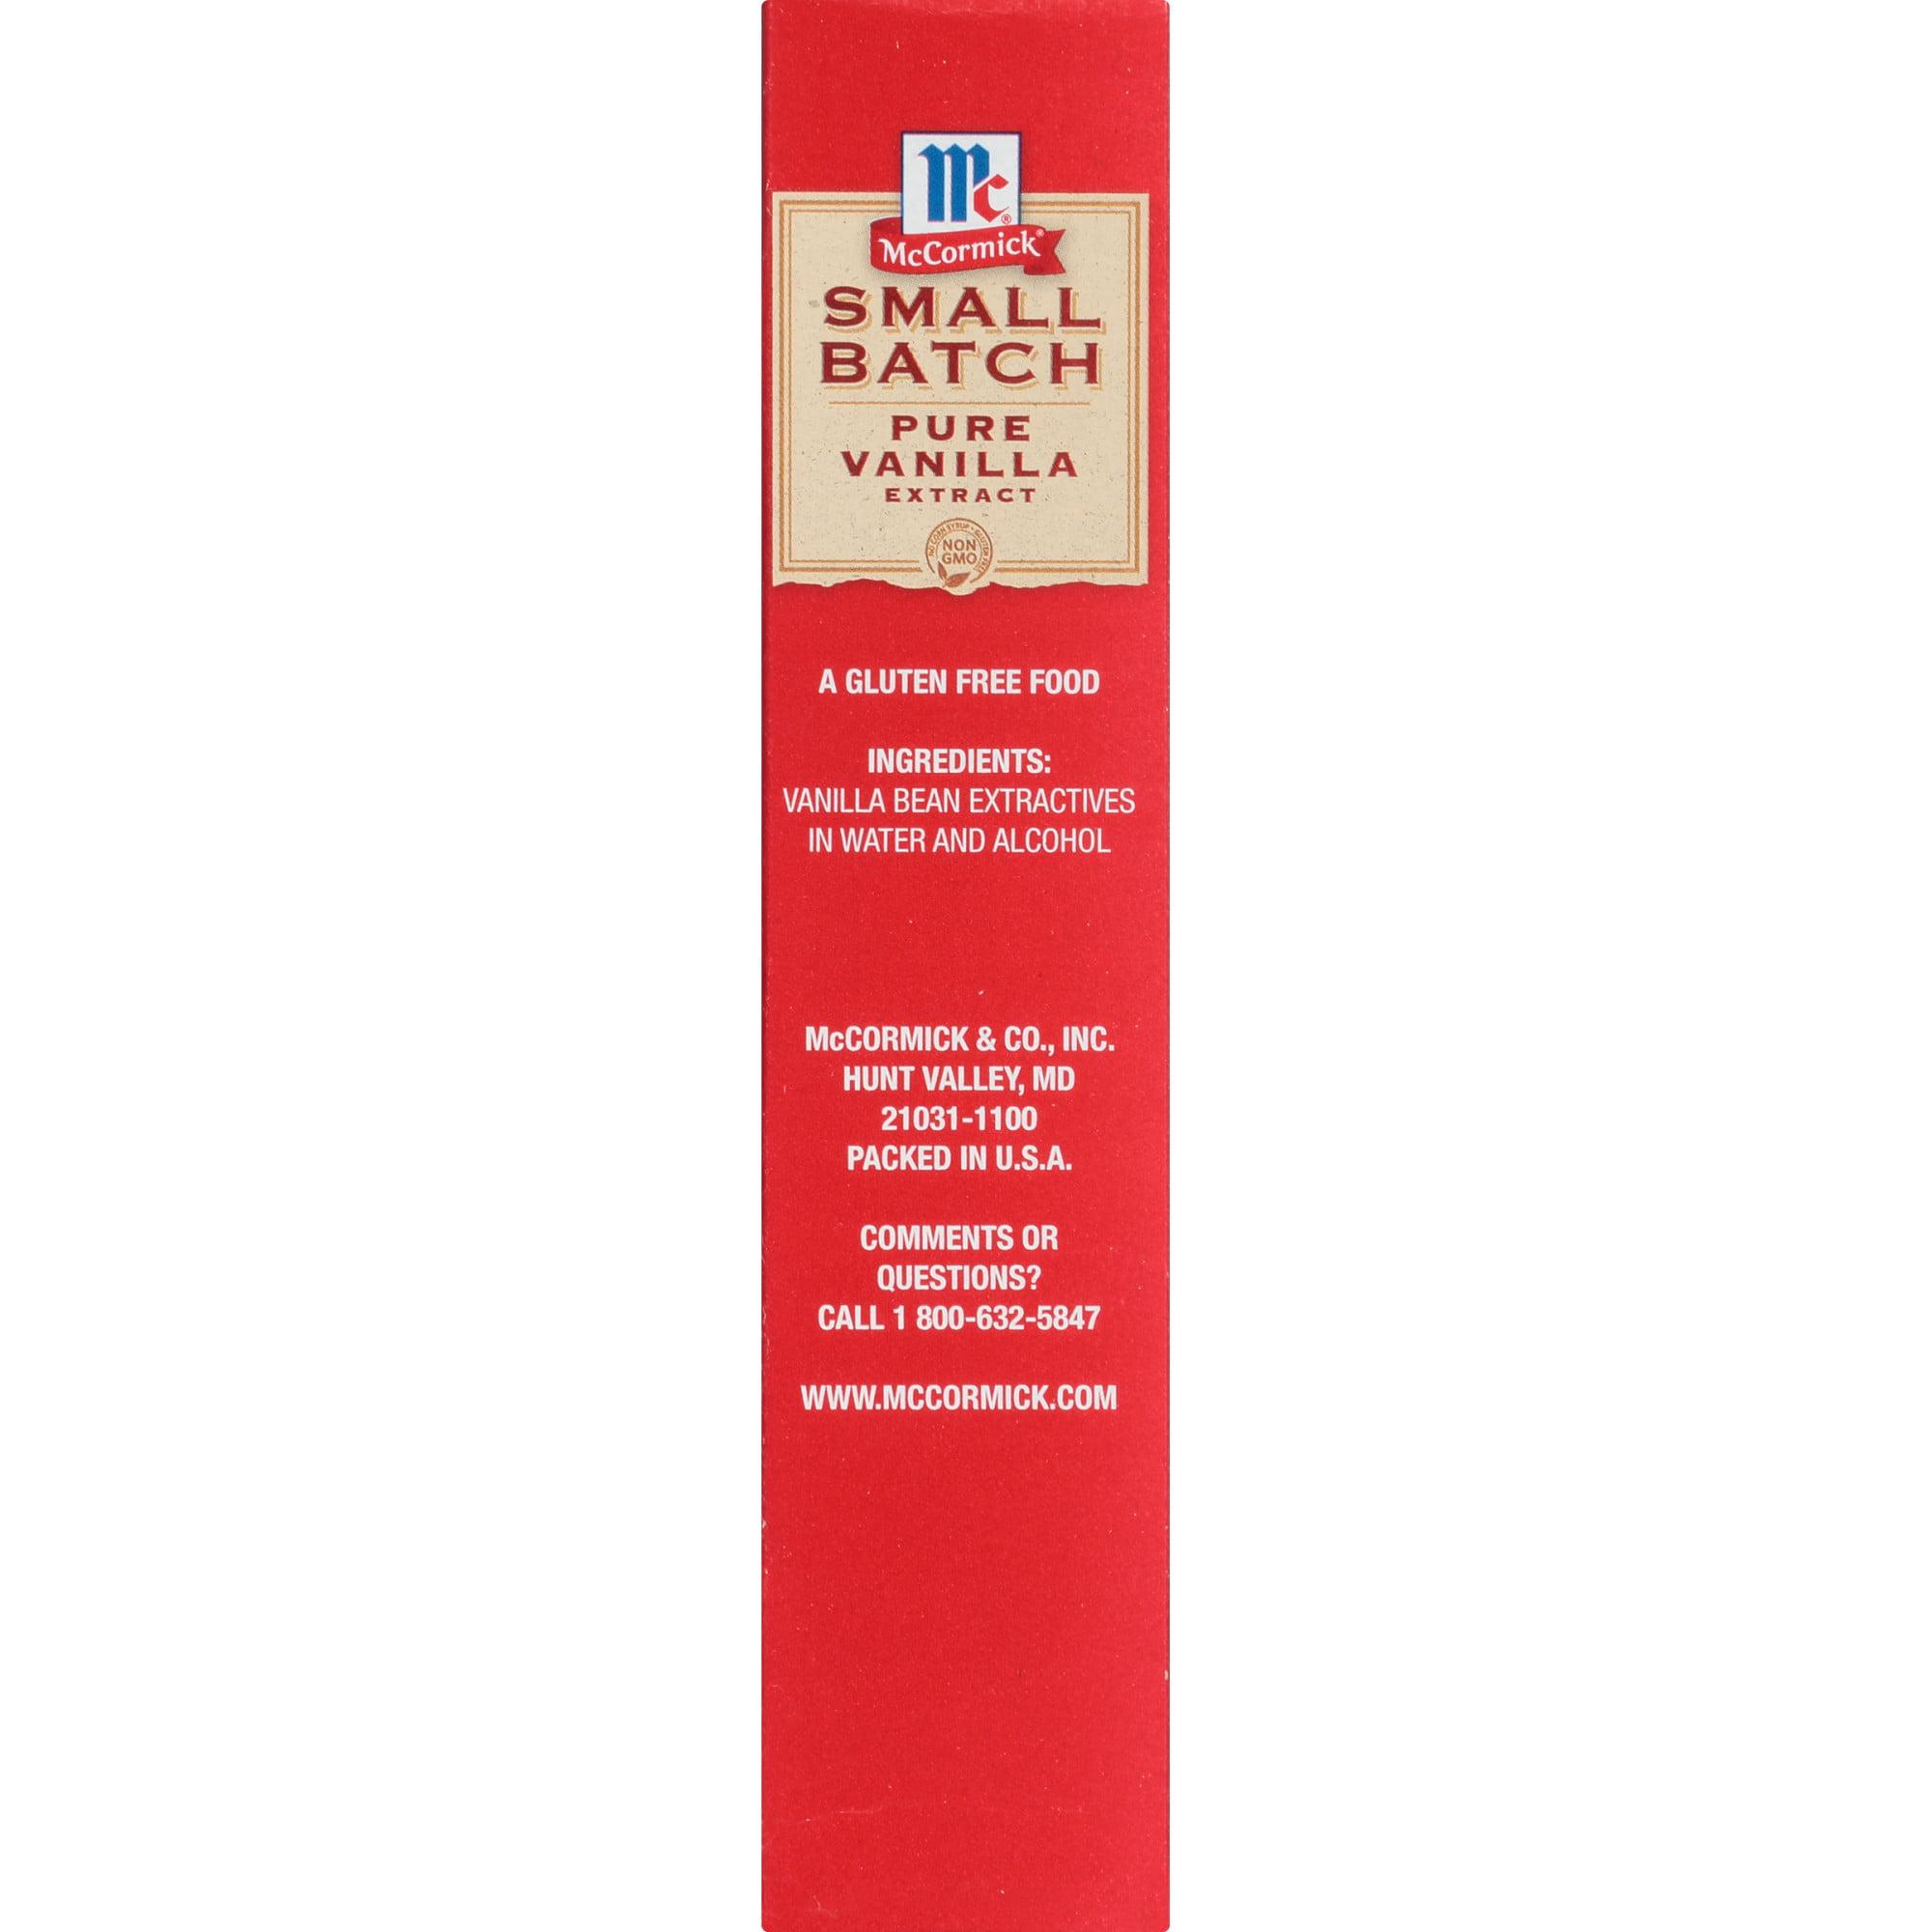 Small Batch Pure Vanilla Extract